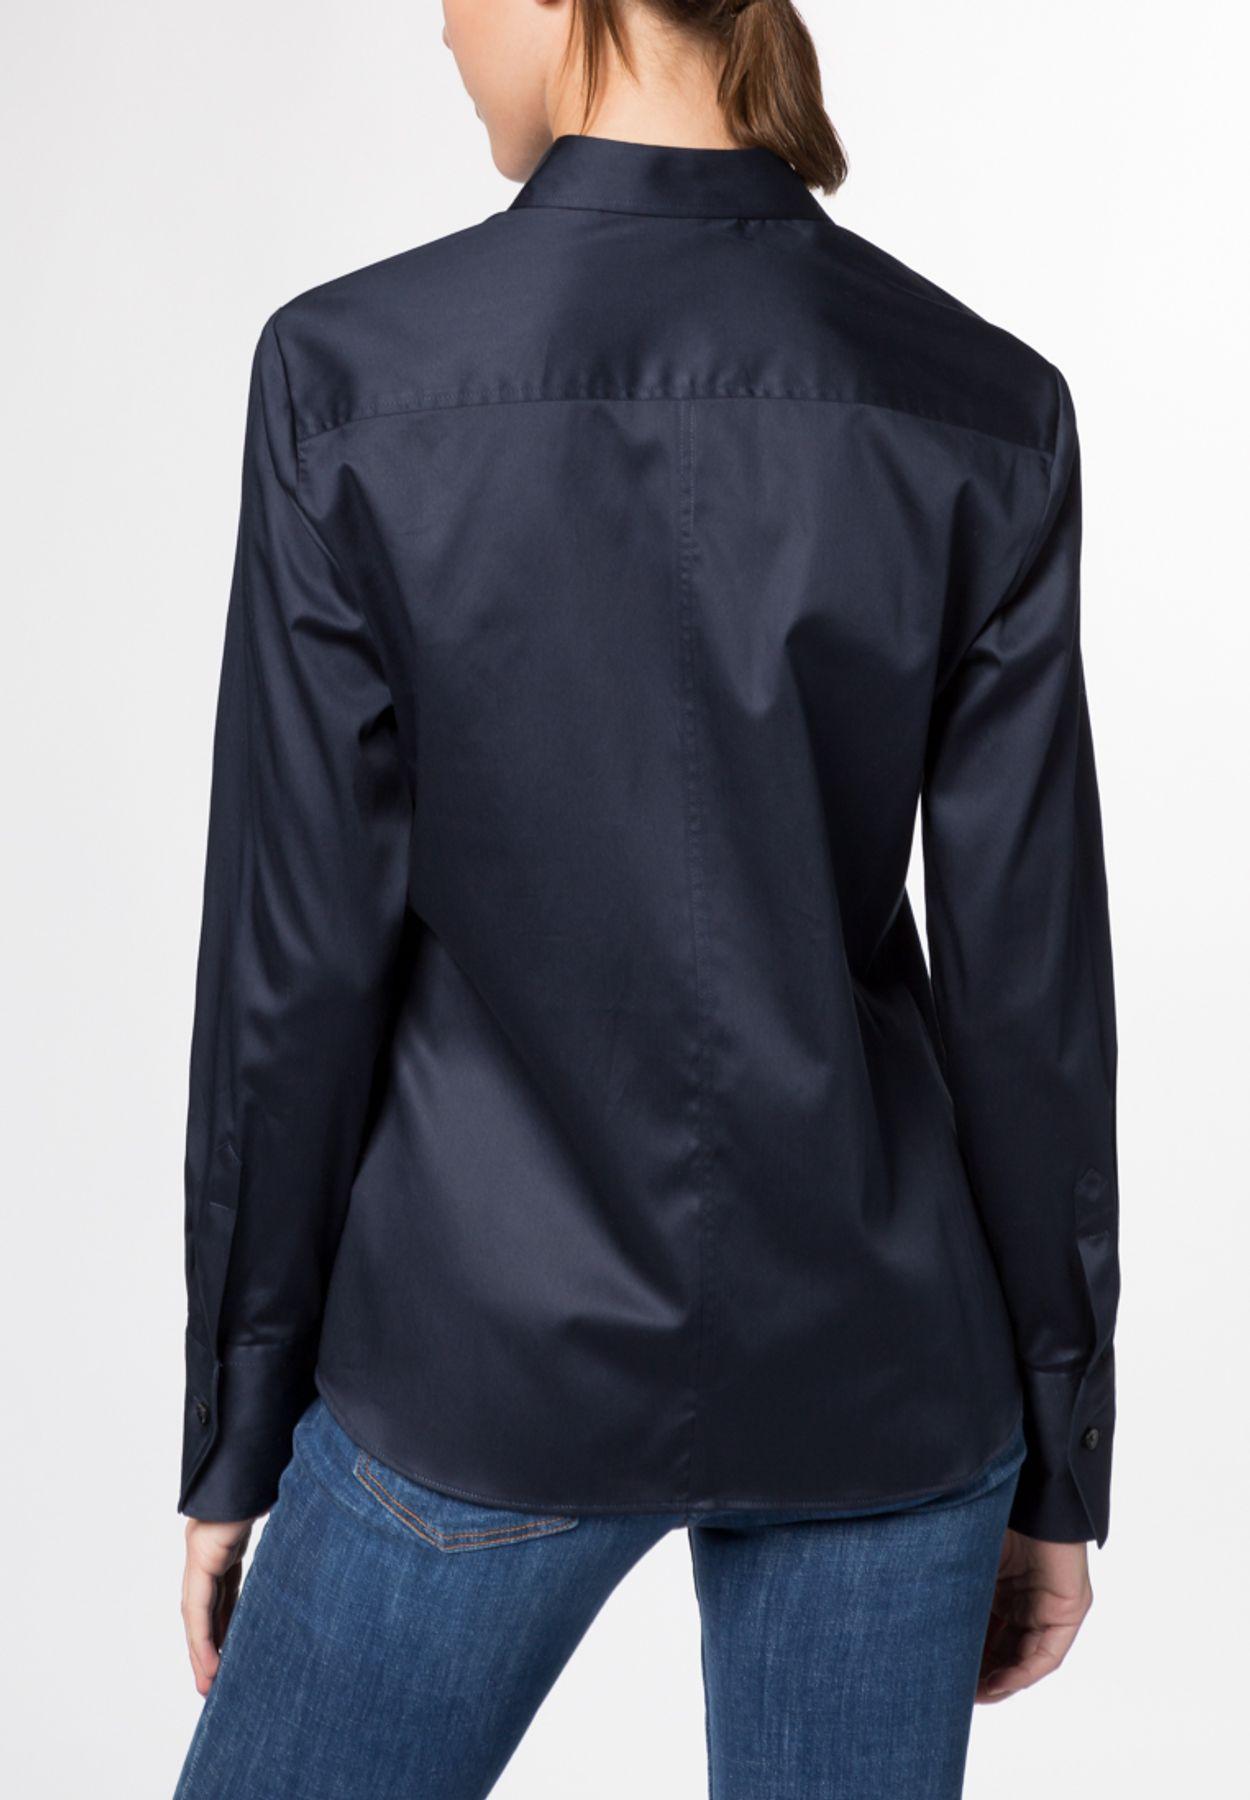 Eterna - Comfort Fit - Damen Langarm Bluse Modern Classic Stretch in versch. Farben (5352 D708) – Bild 15